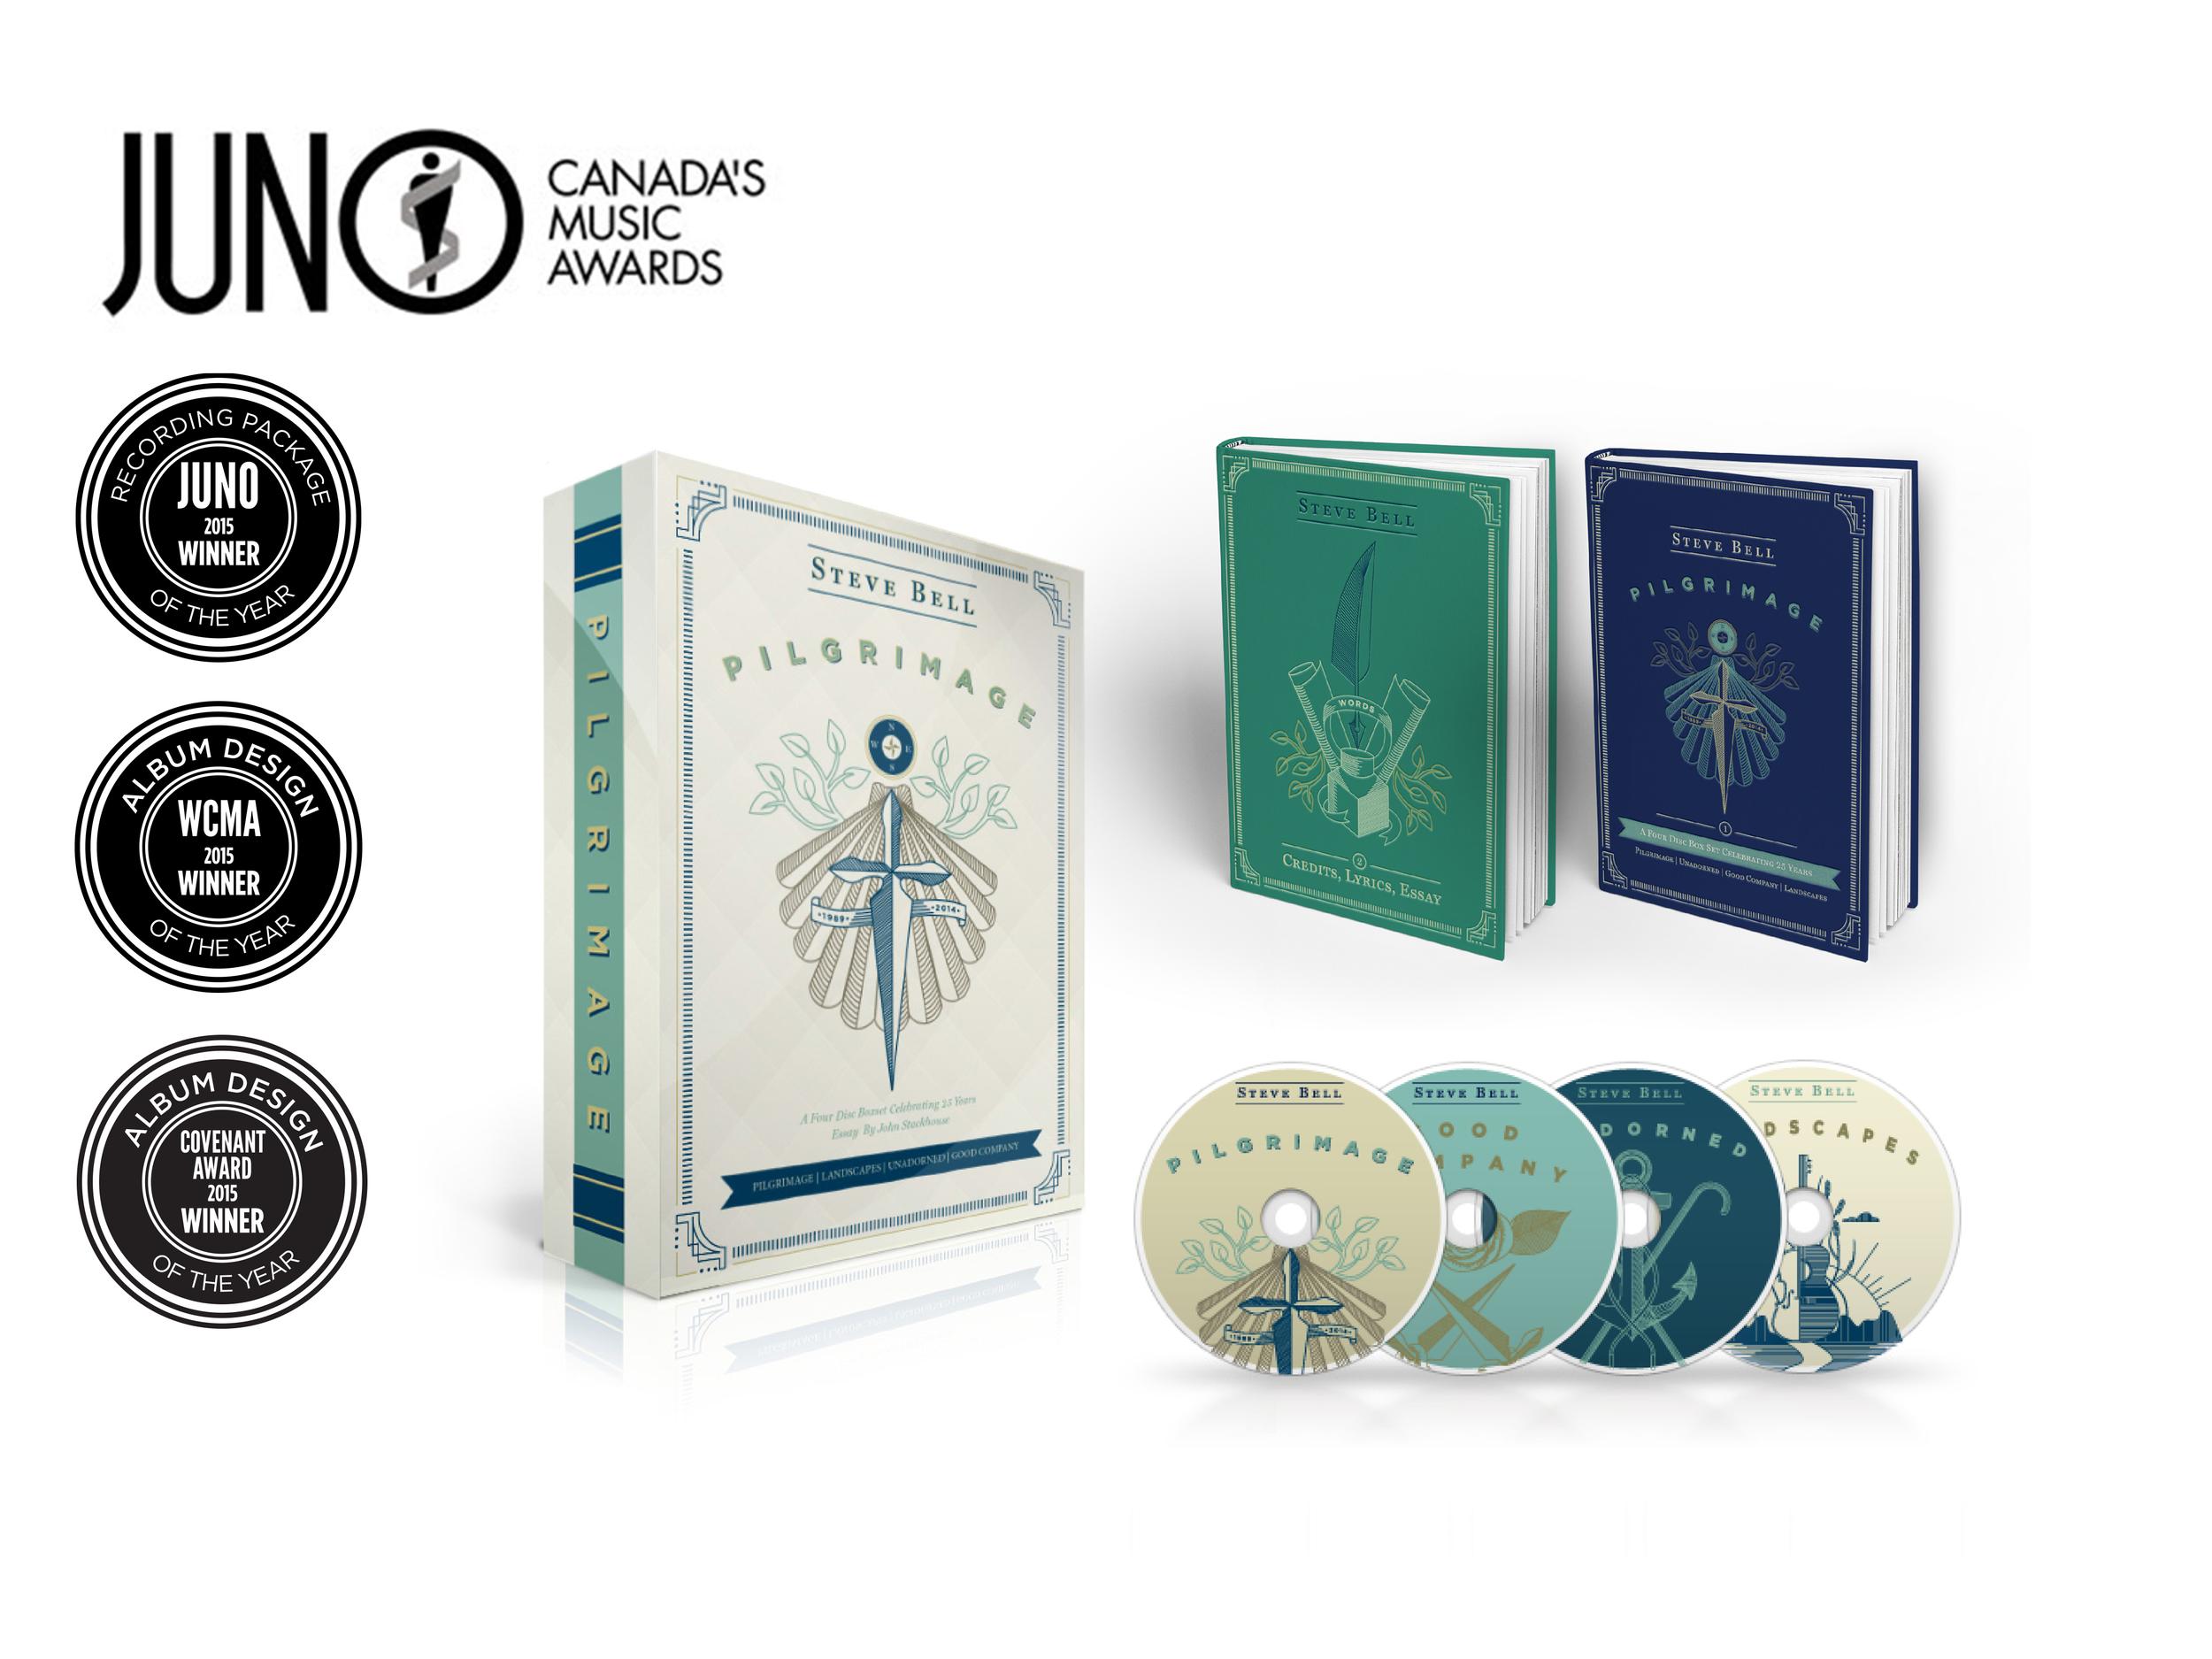 JUNO, WCMA & Covenant Award Winning, 4 Disc Box Set